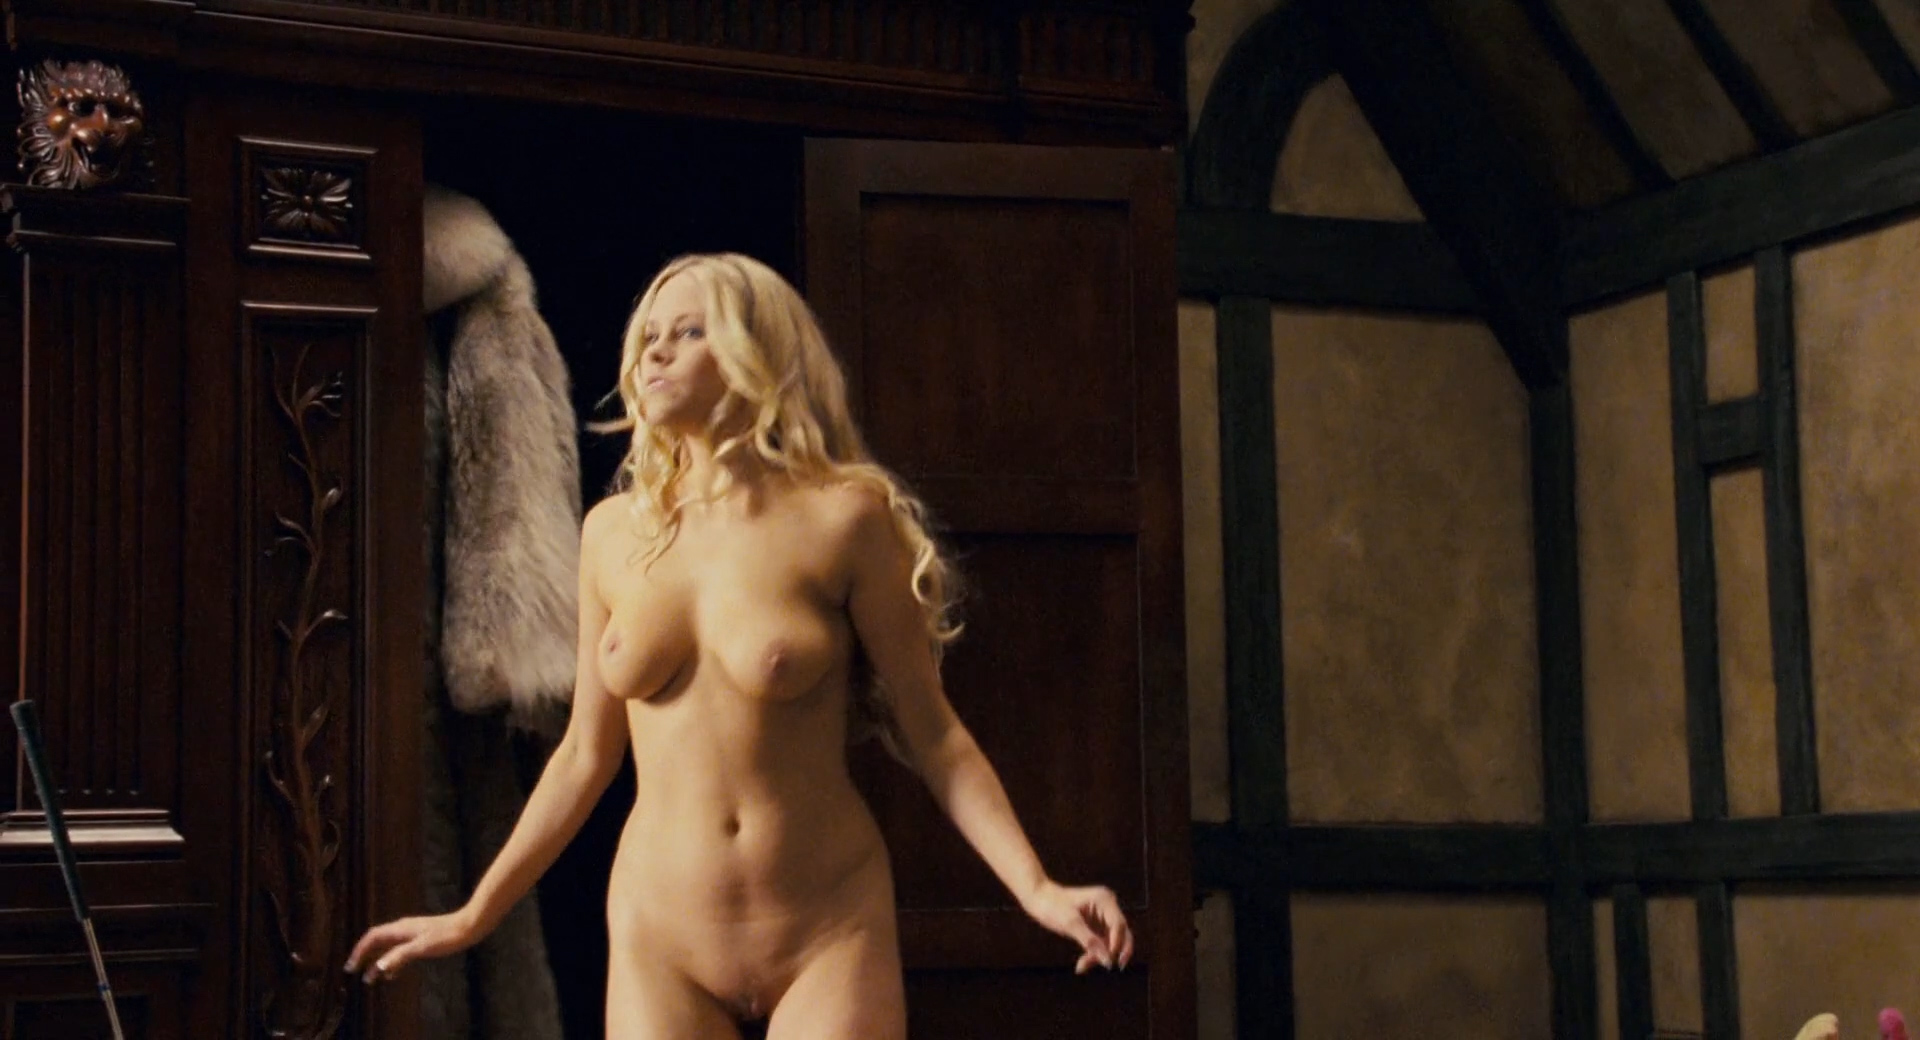 multiple orgasms by masturbating handjob